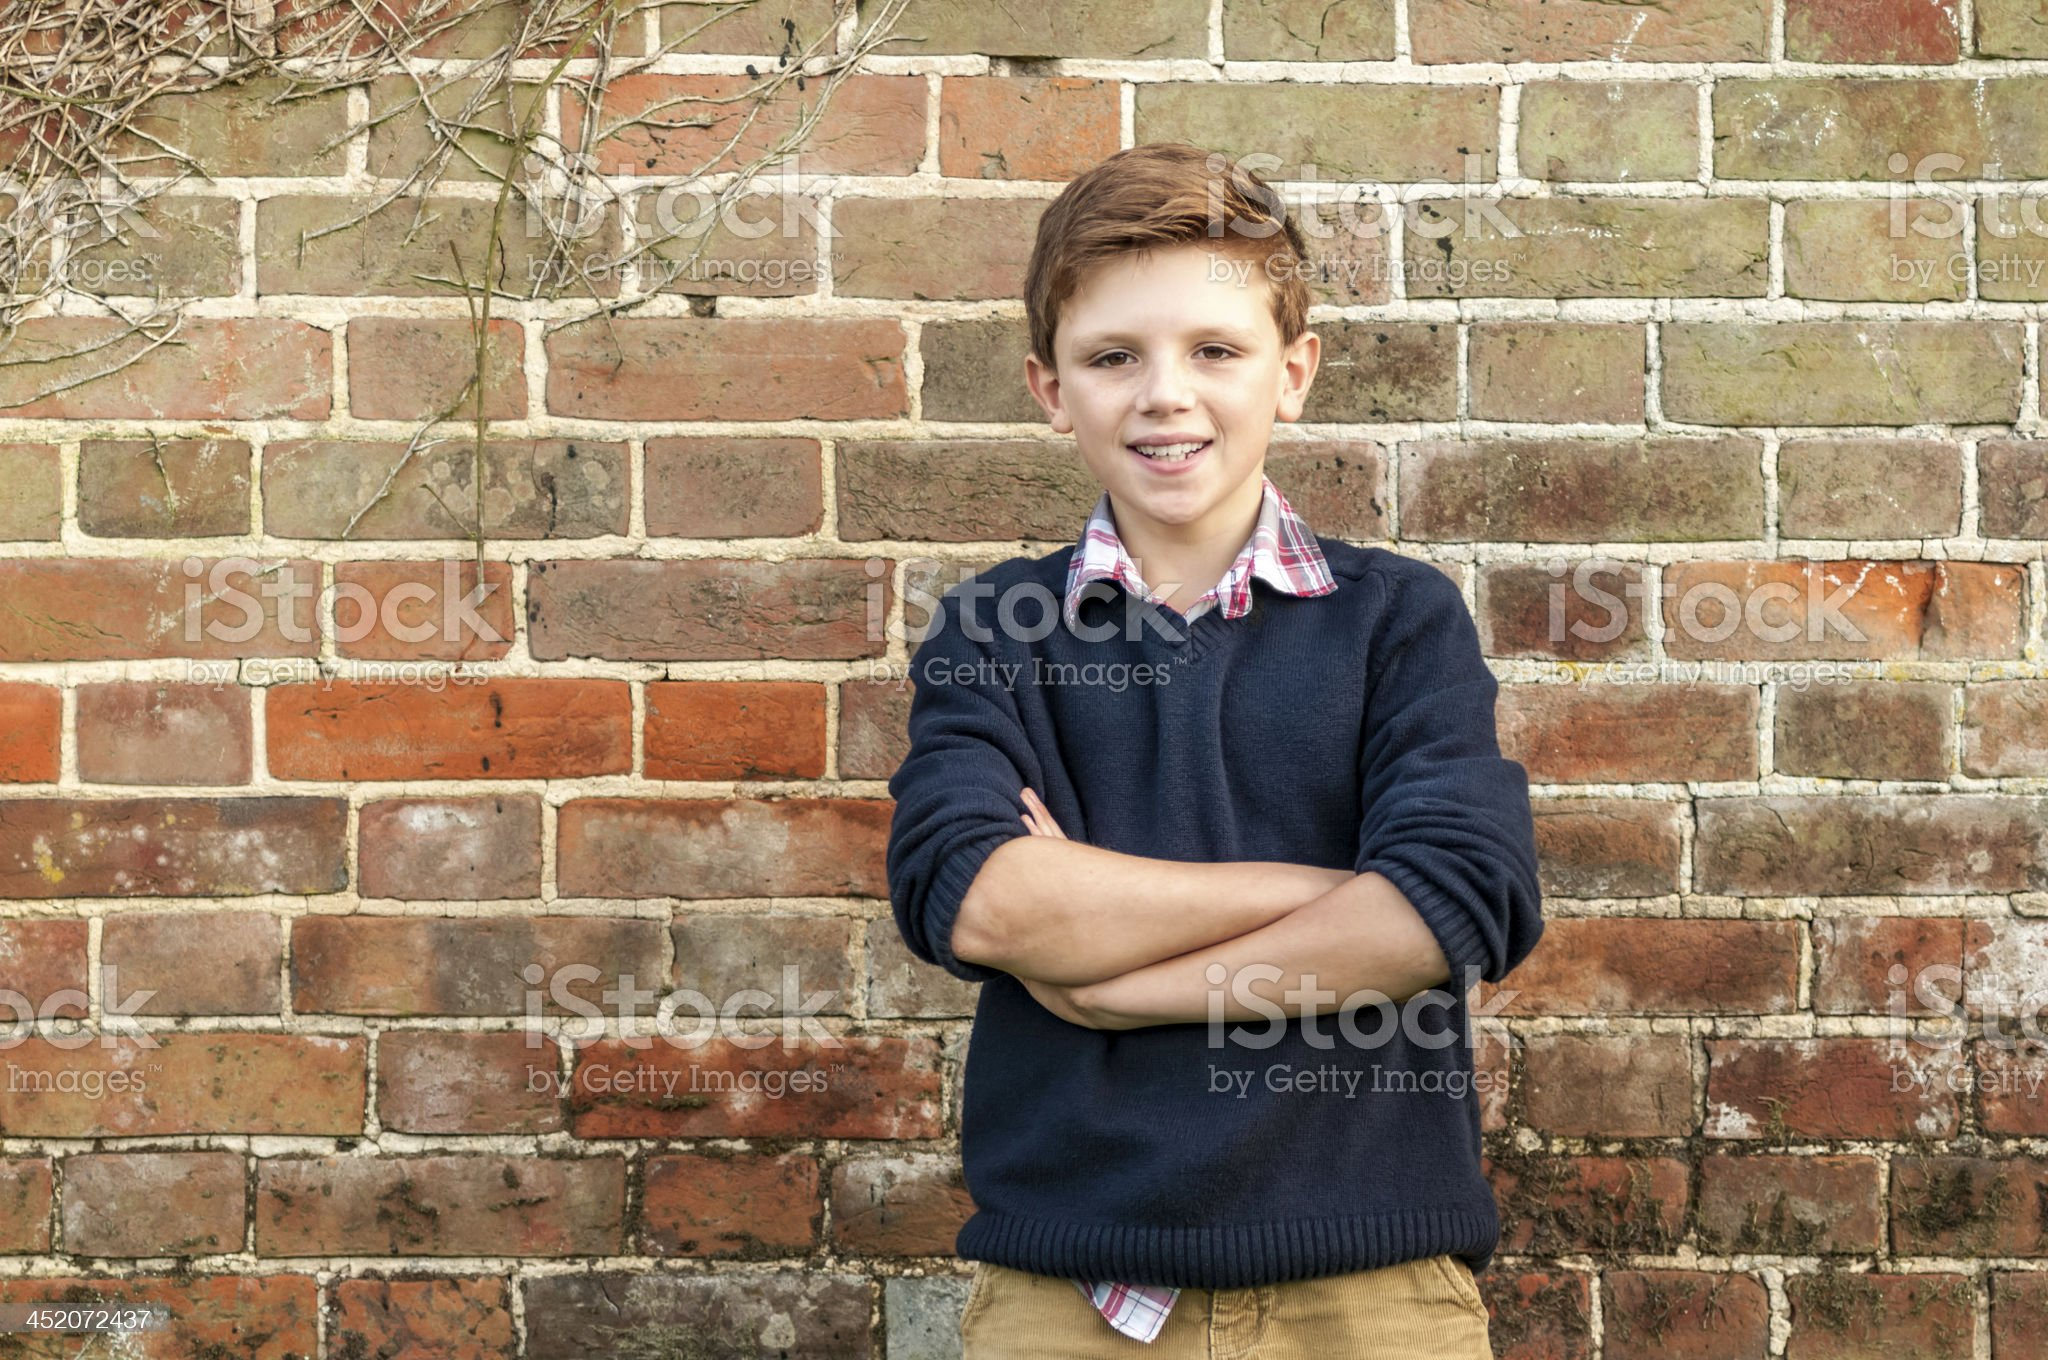 Young farm boy posing - I royalty-free stock photo